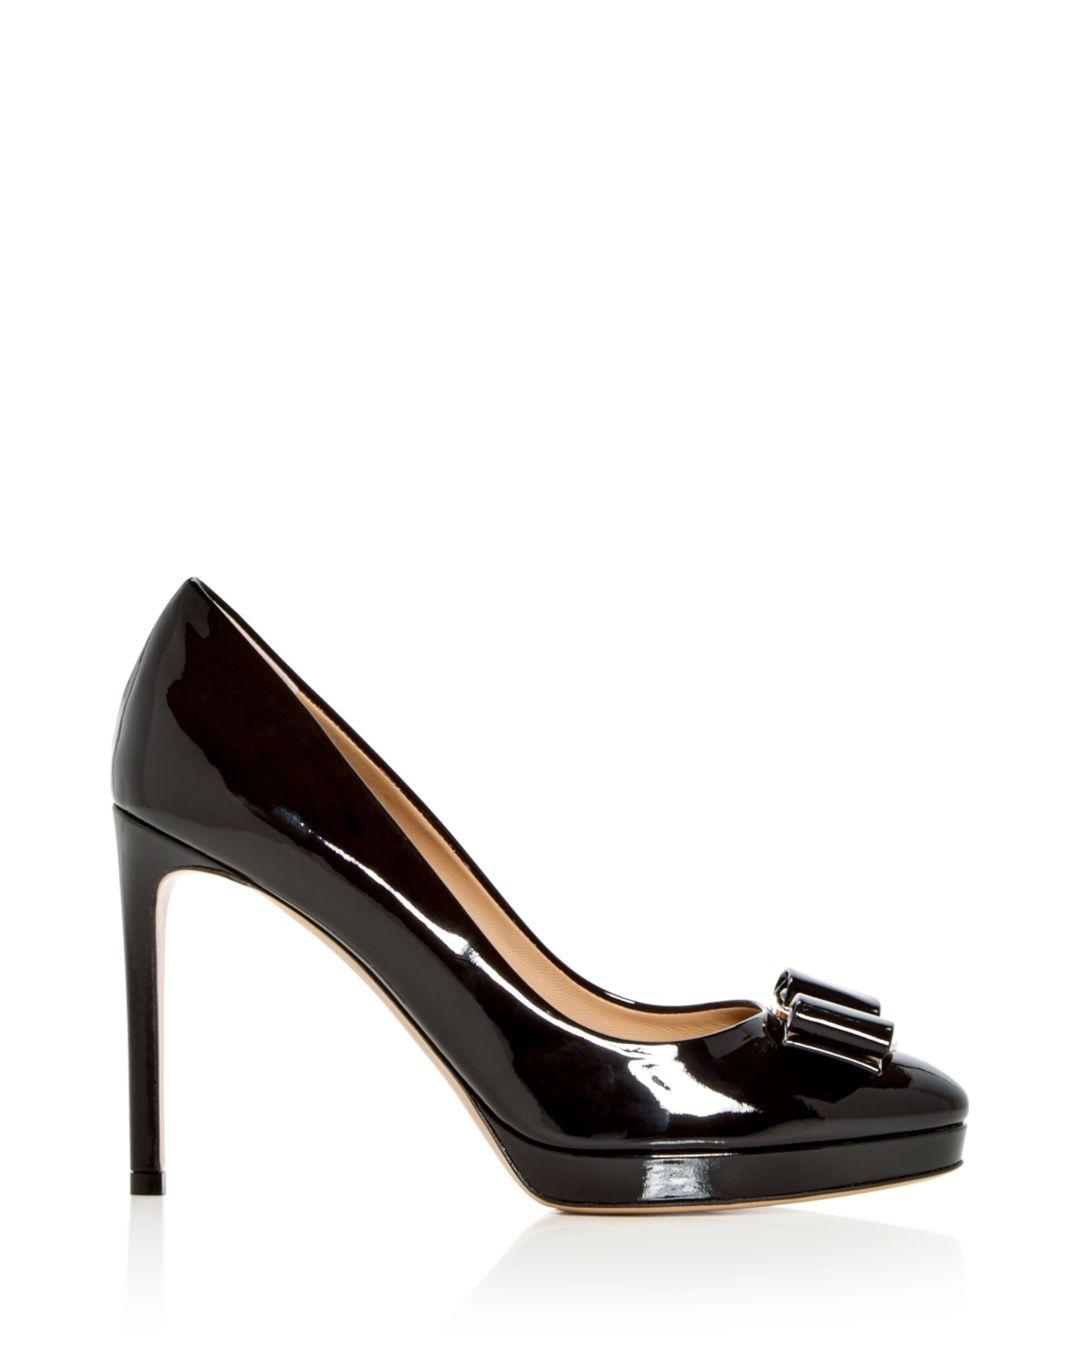 Women's Osimo Patent Leather High Heel Platform Pumps